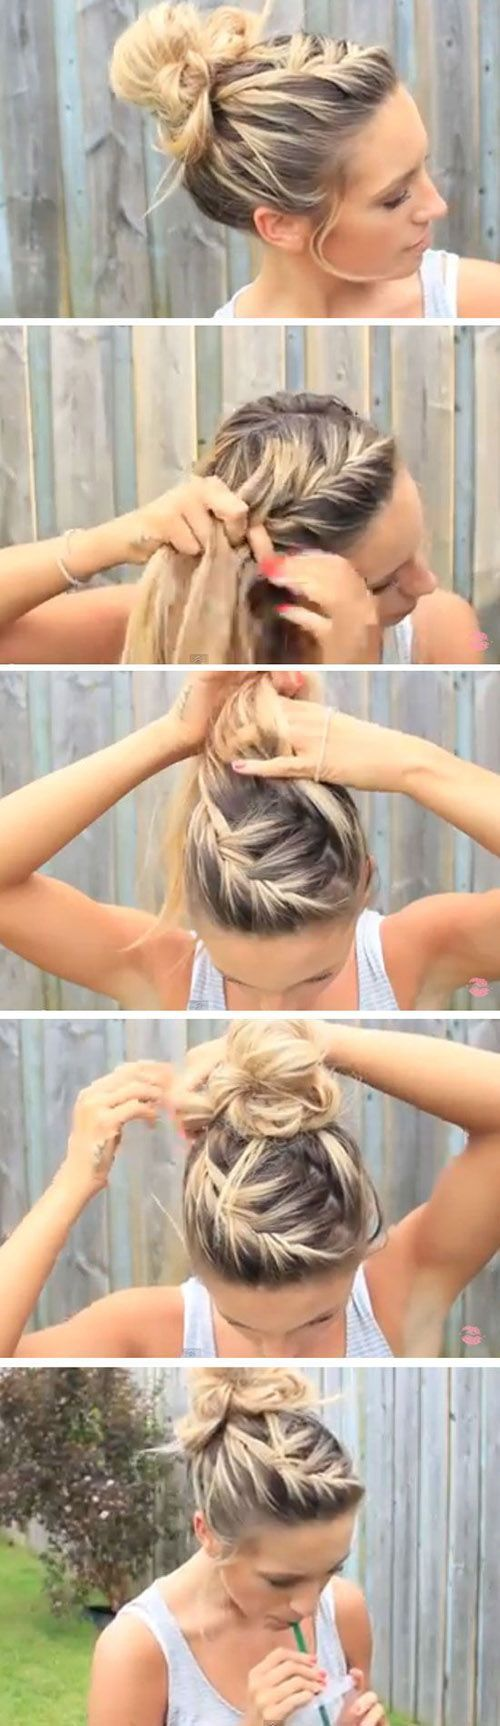 Easy diy hairstyles for the beach izzydaisy hairstyles